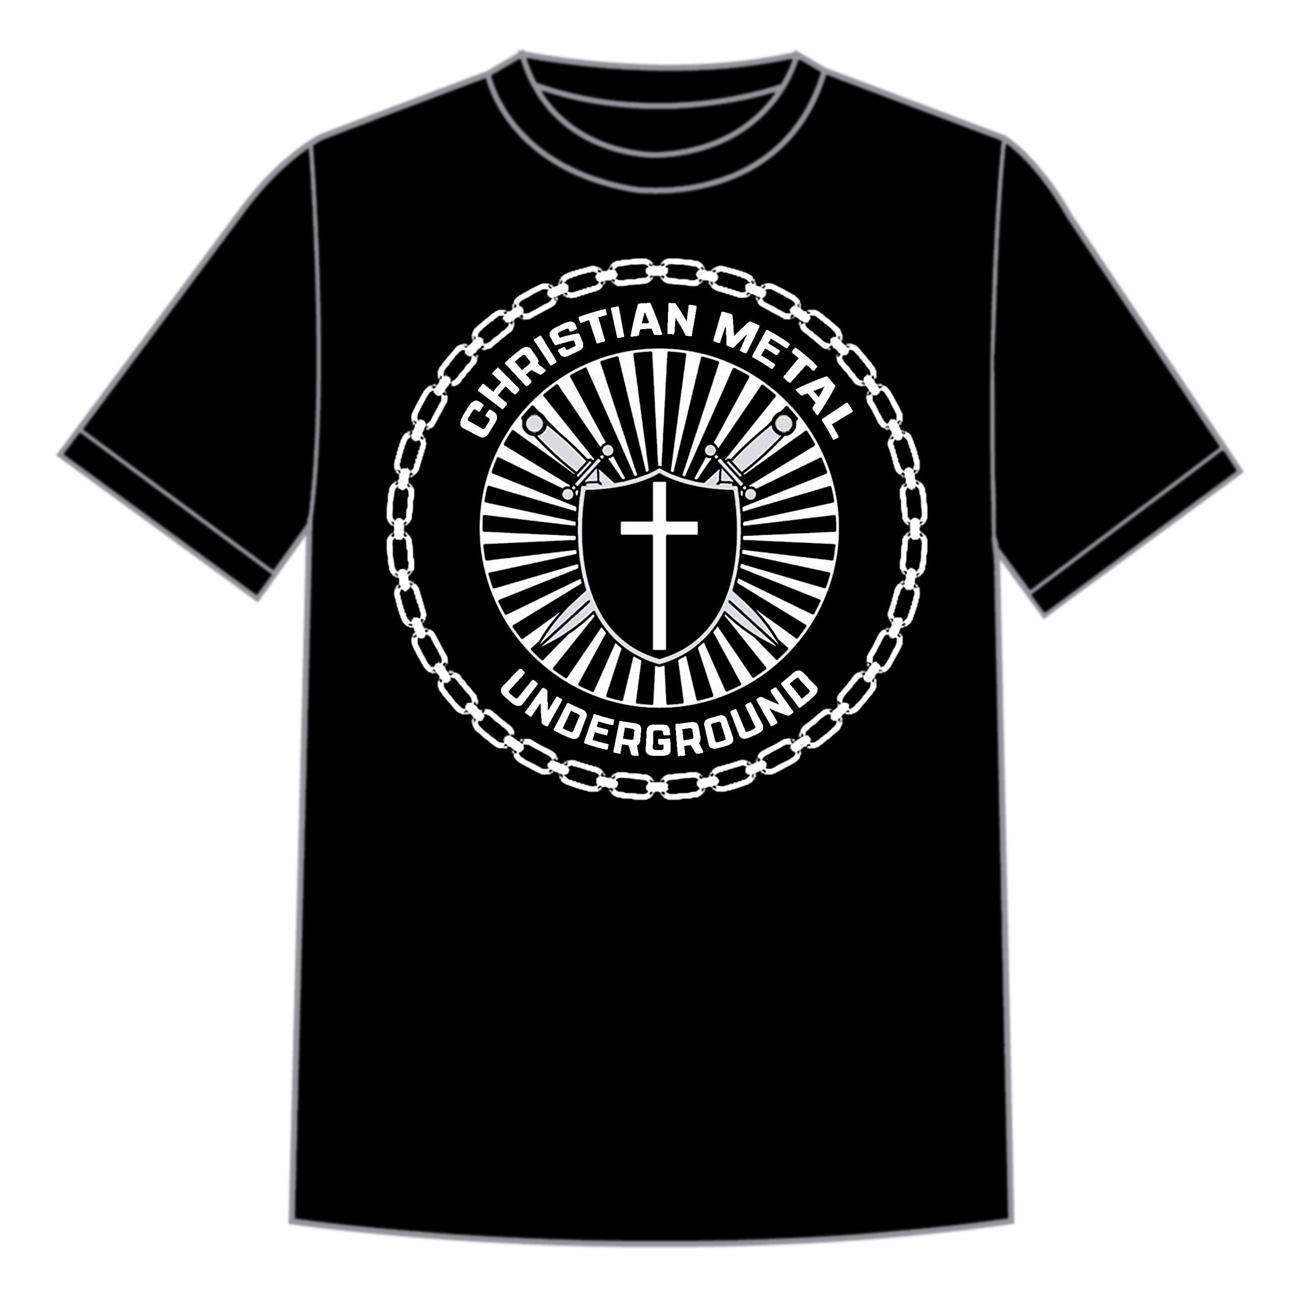 Christian Metal Underground Records Logo Shirt Vision